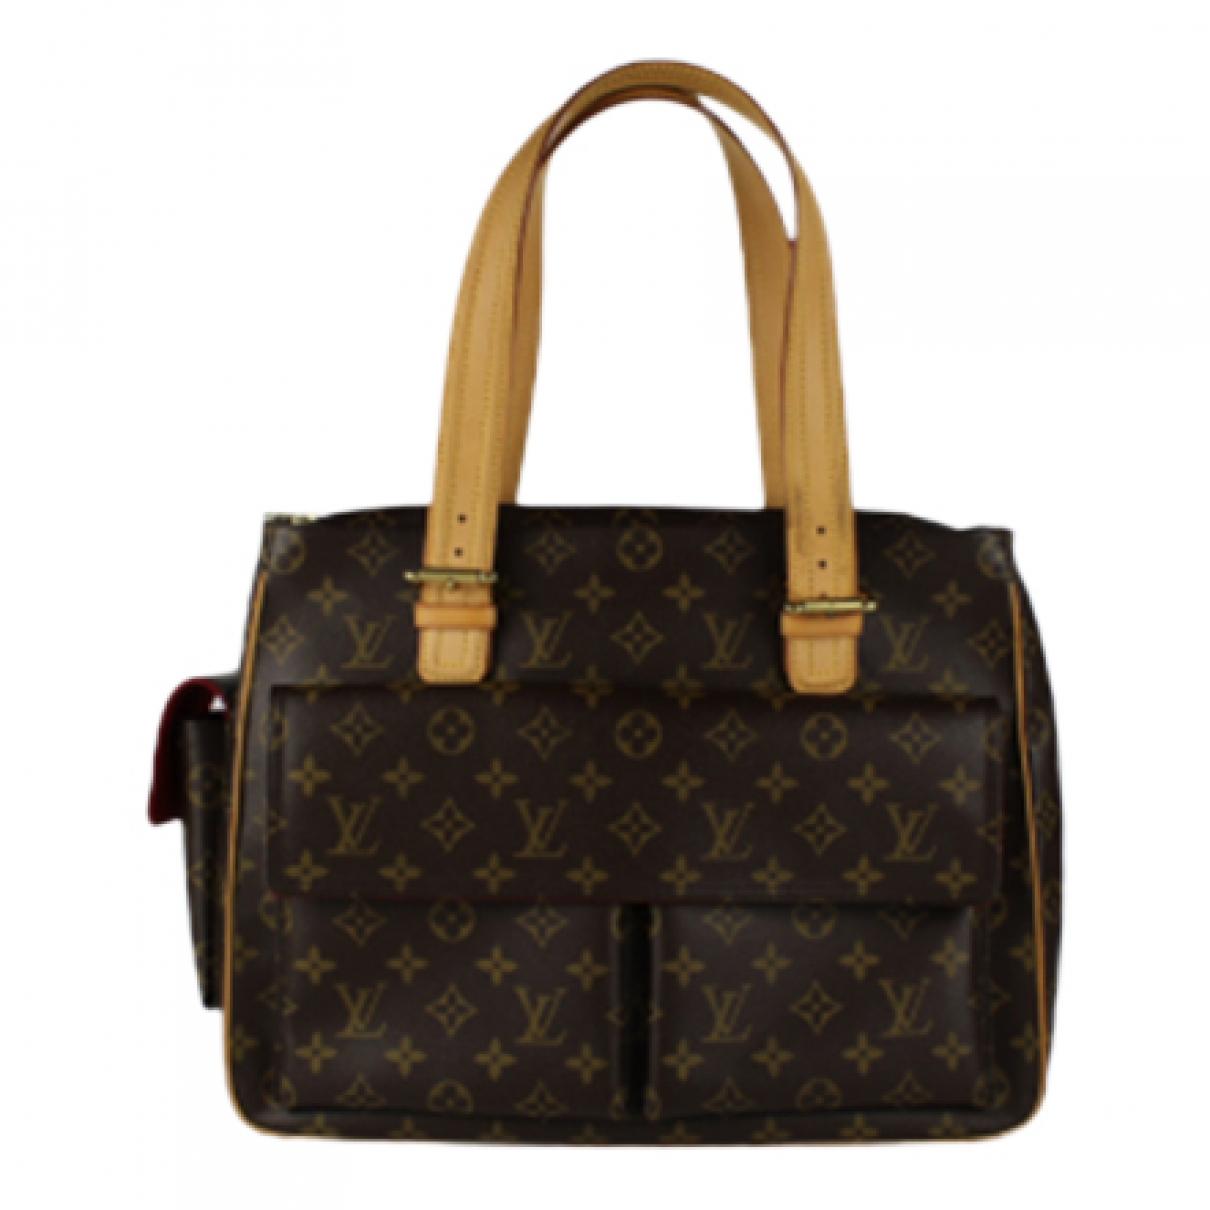 Bolso  Multipli Cite  de Lona Louis Vuitton